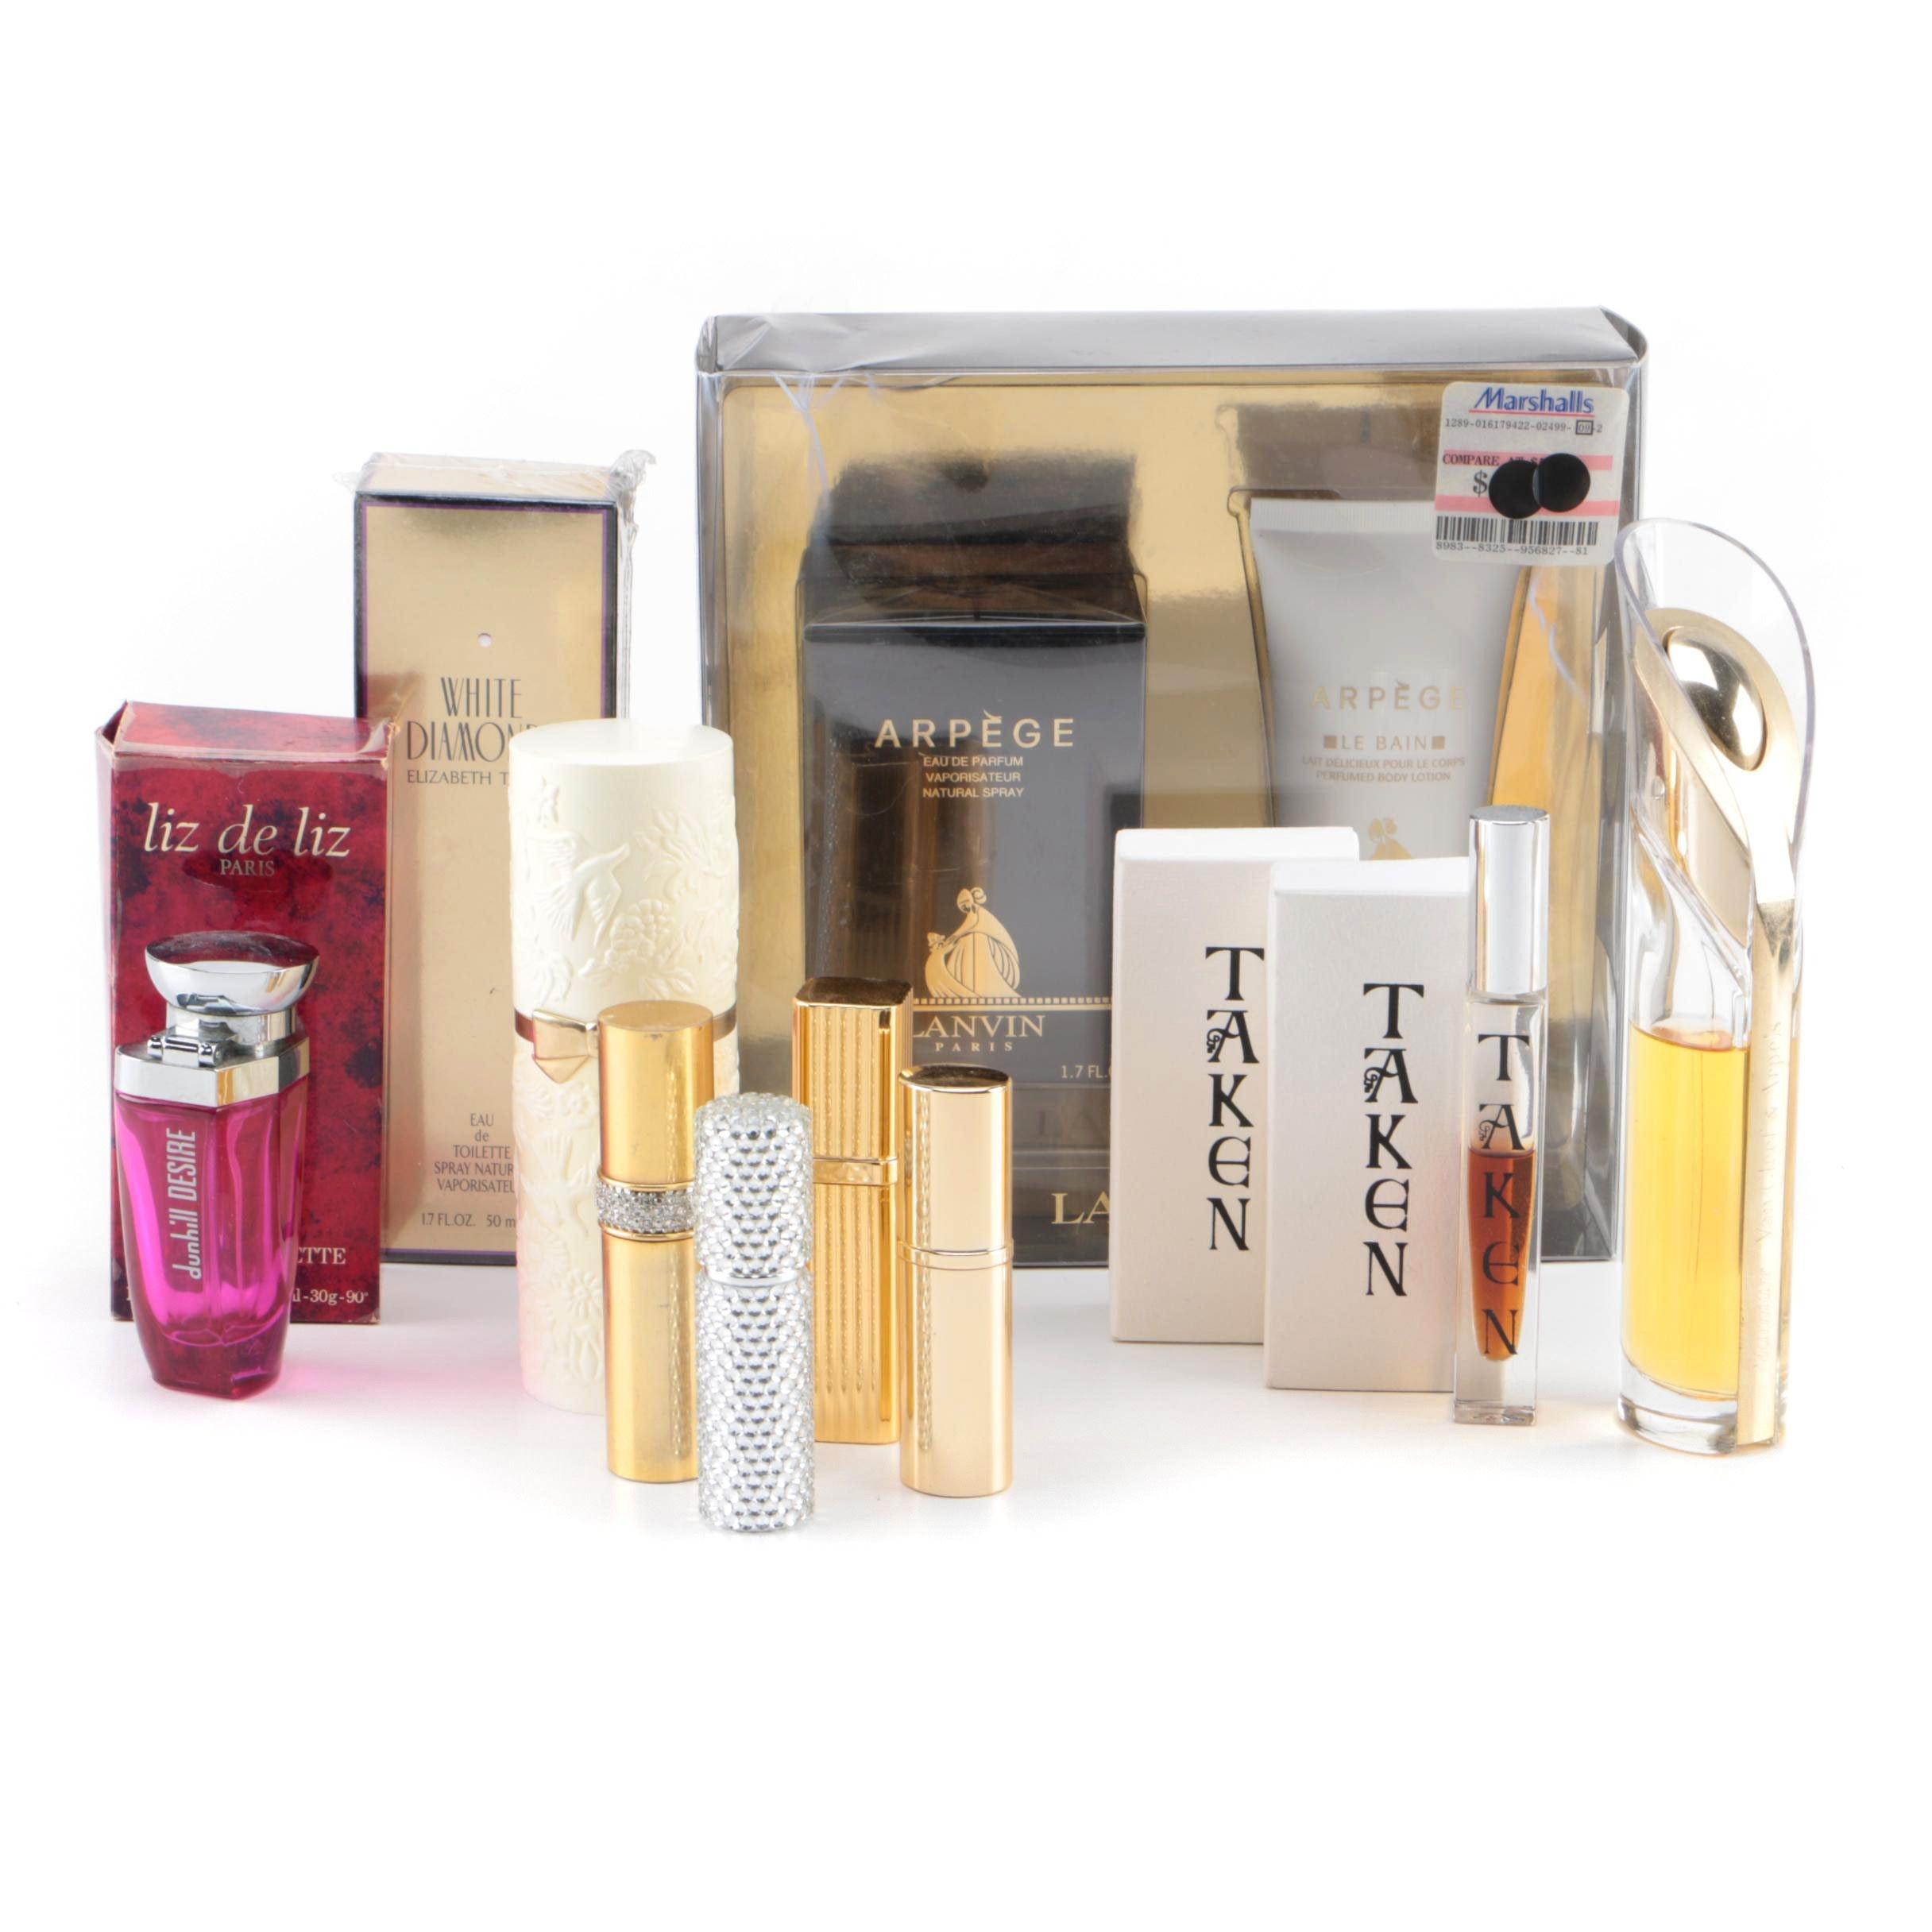 Perfume Including Elizabeth Taylor